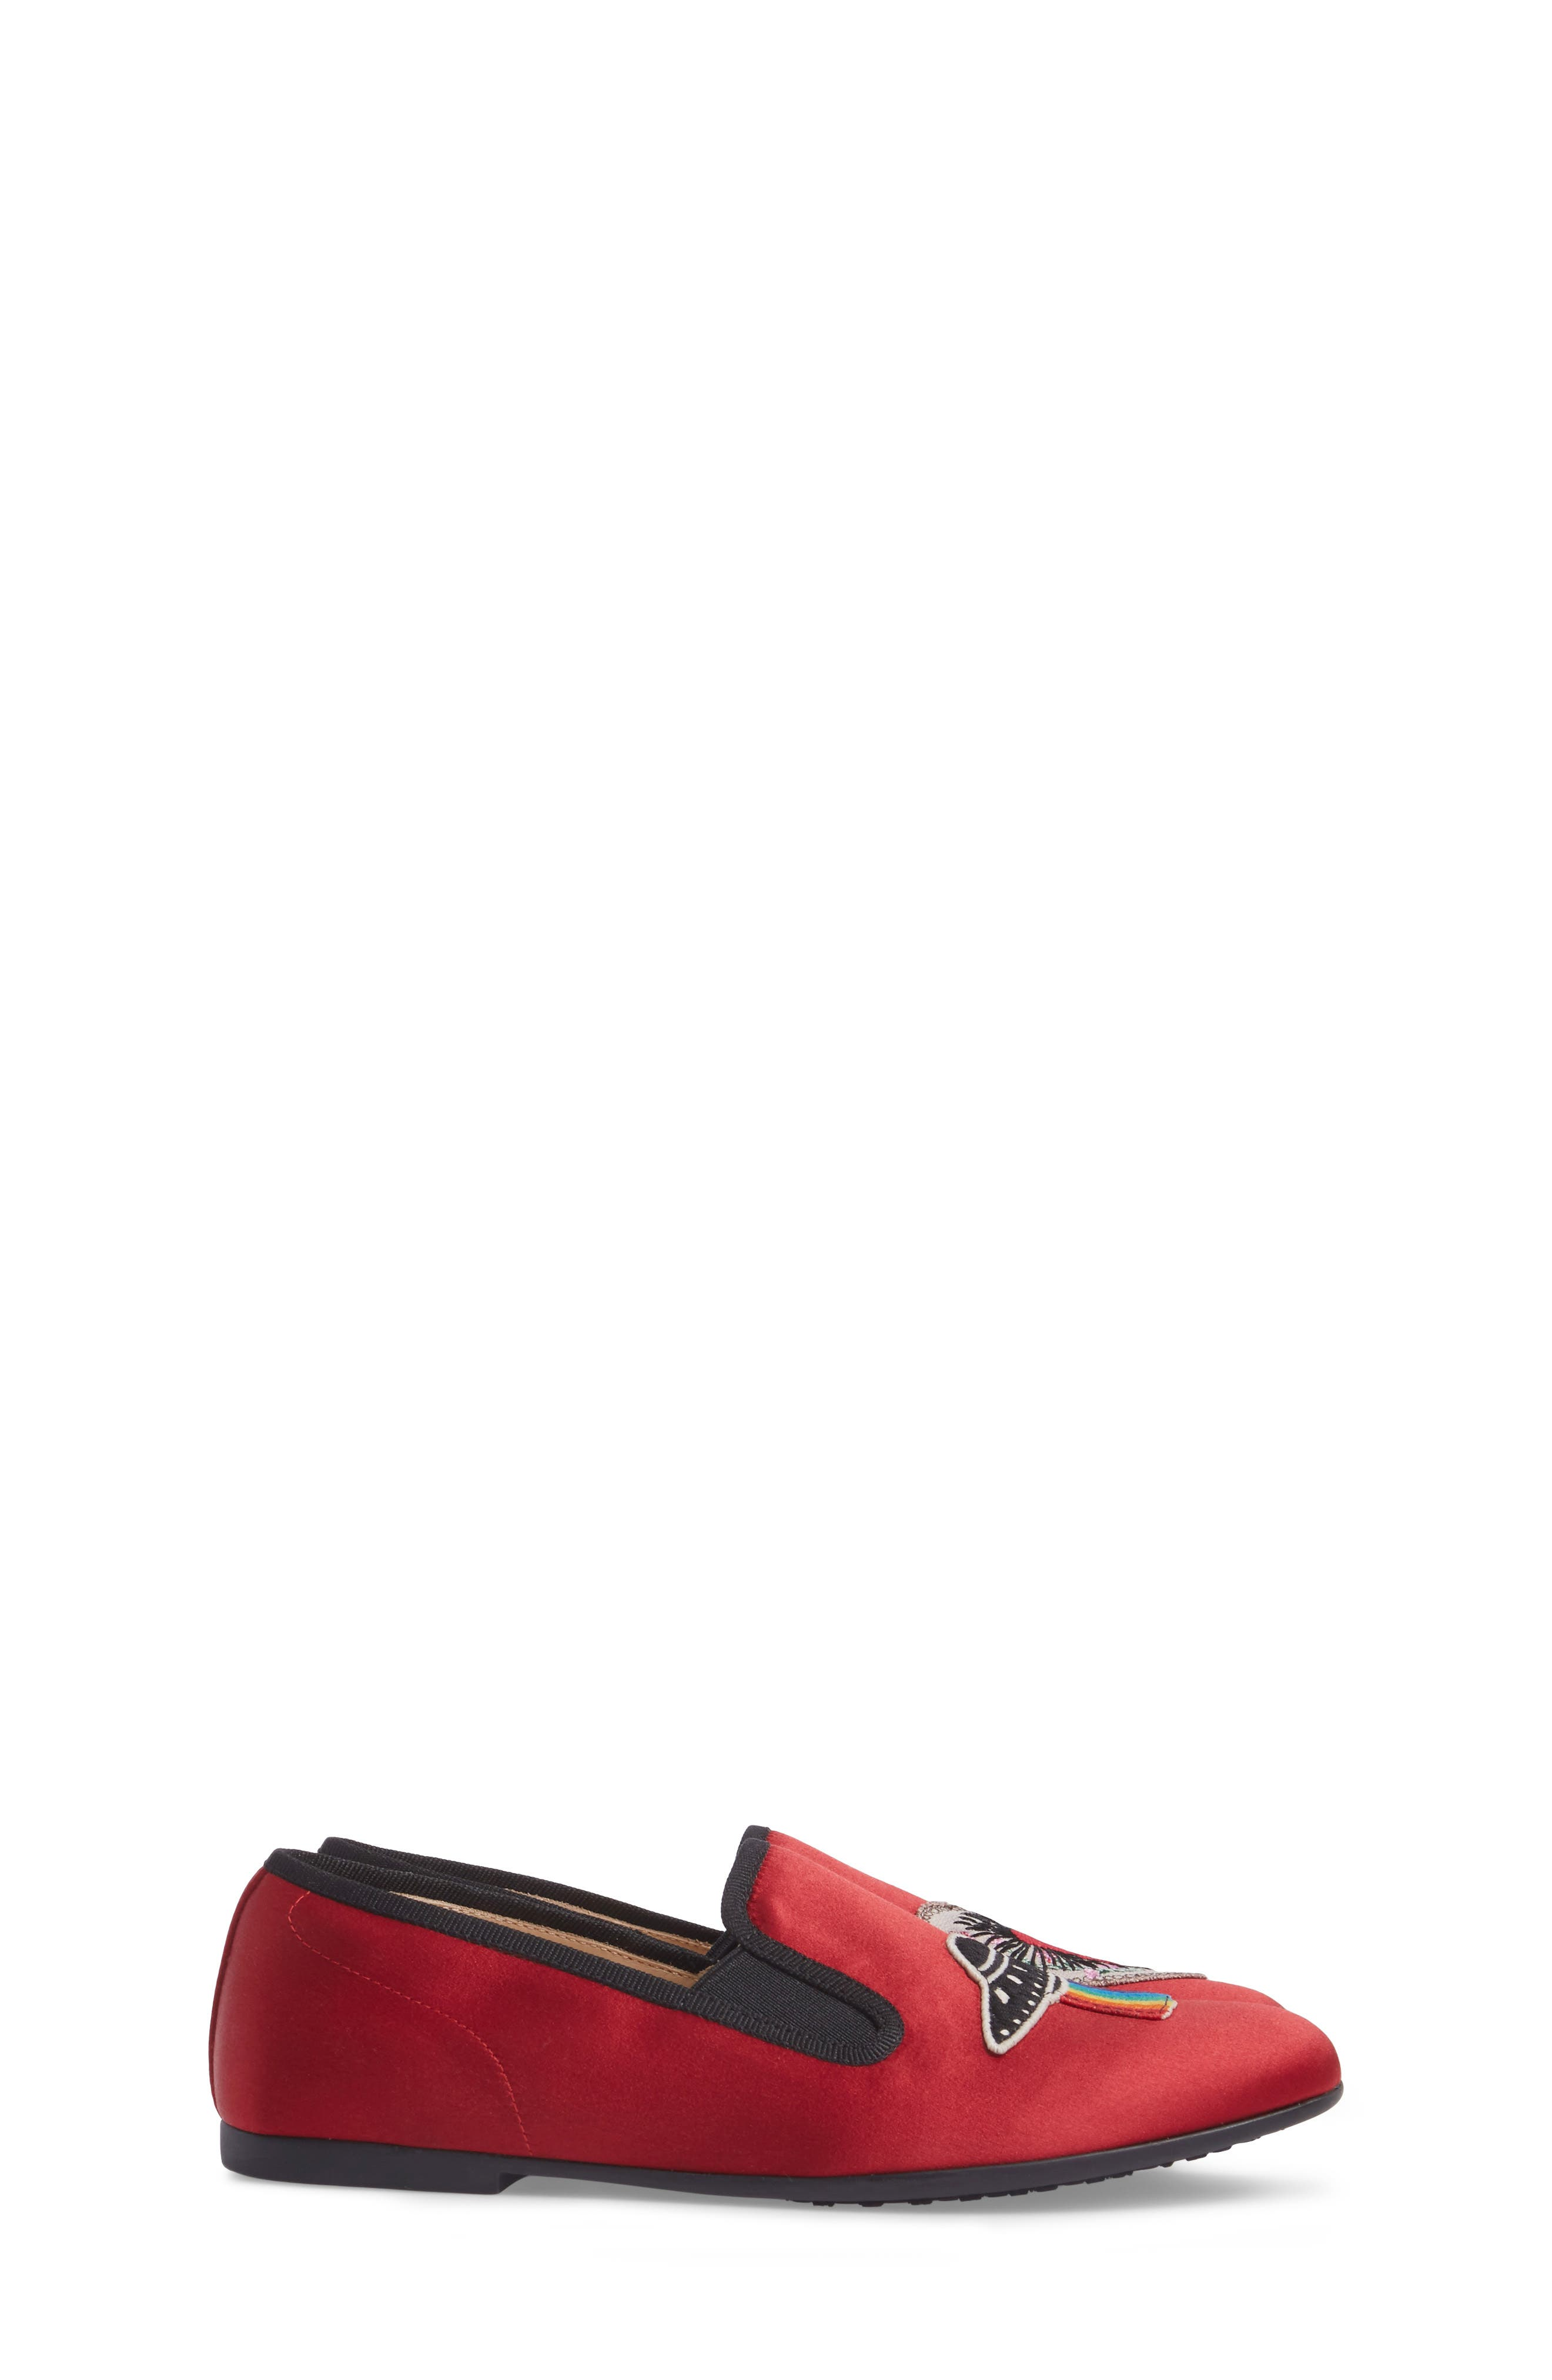 Nannie Appliqué Loafer Flat,                             Alternate thumbnail 3, color,                             Red